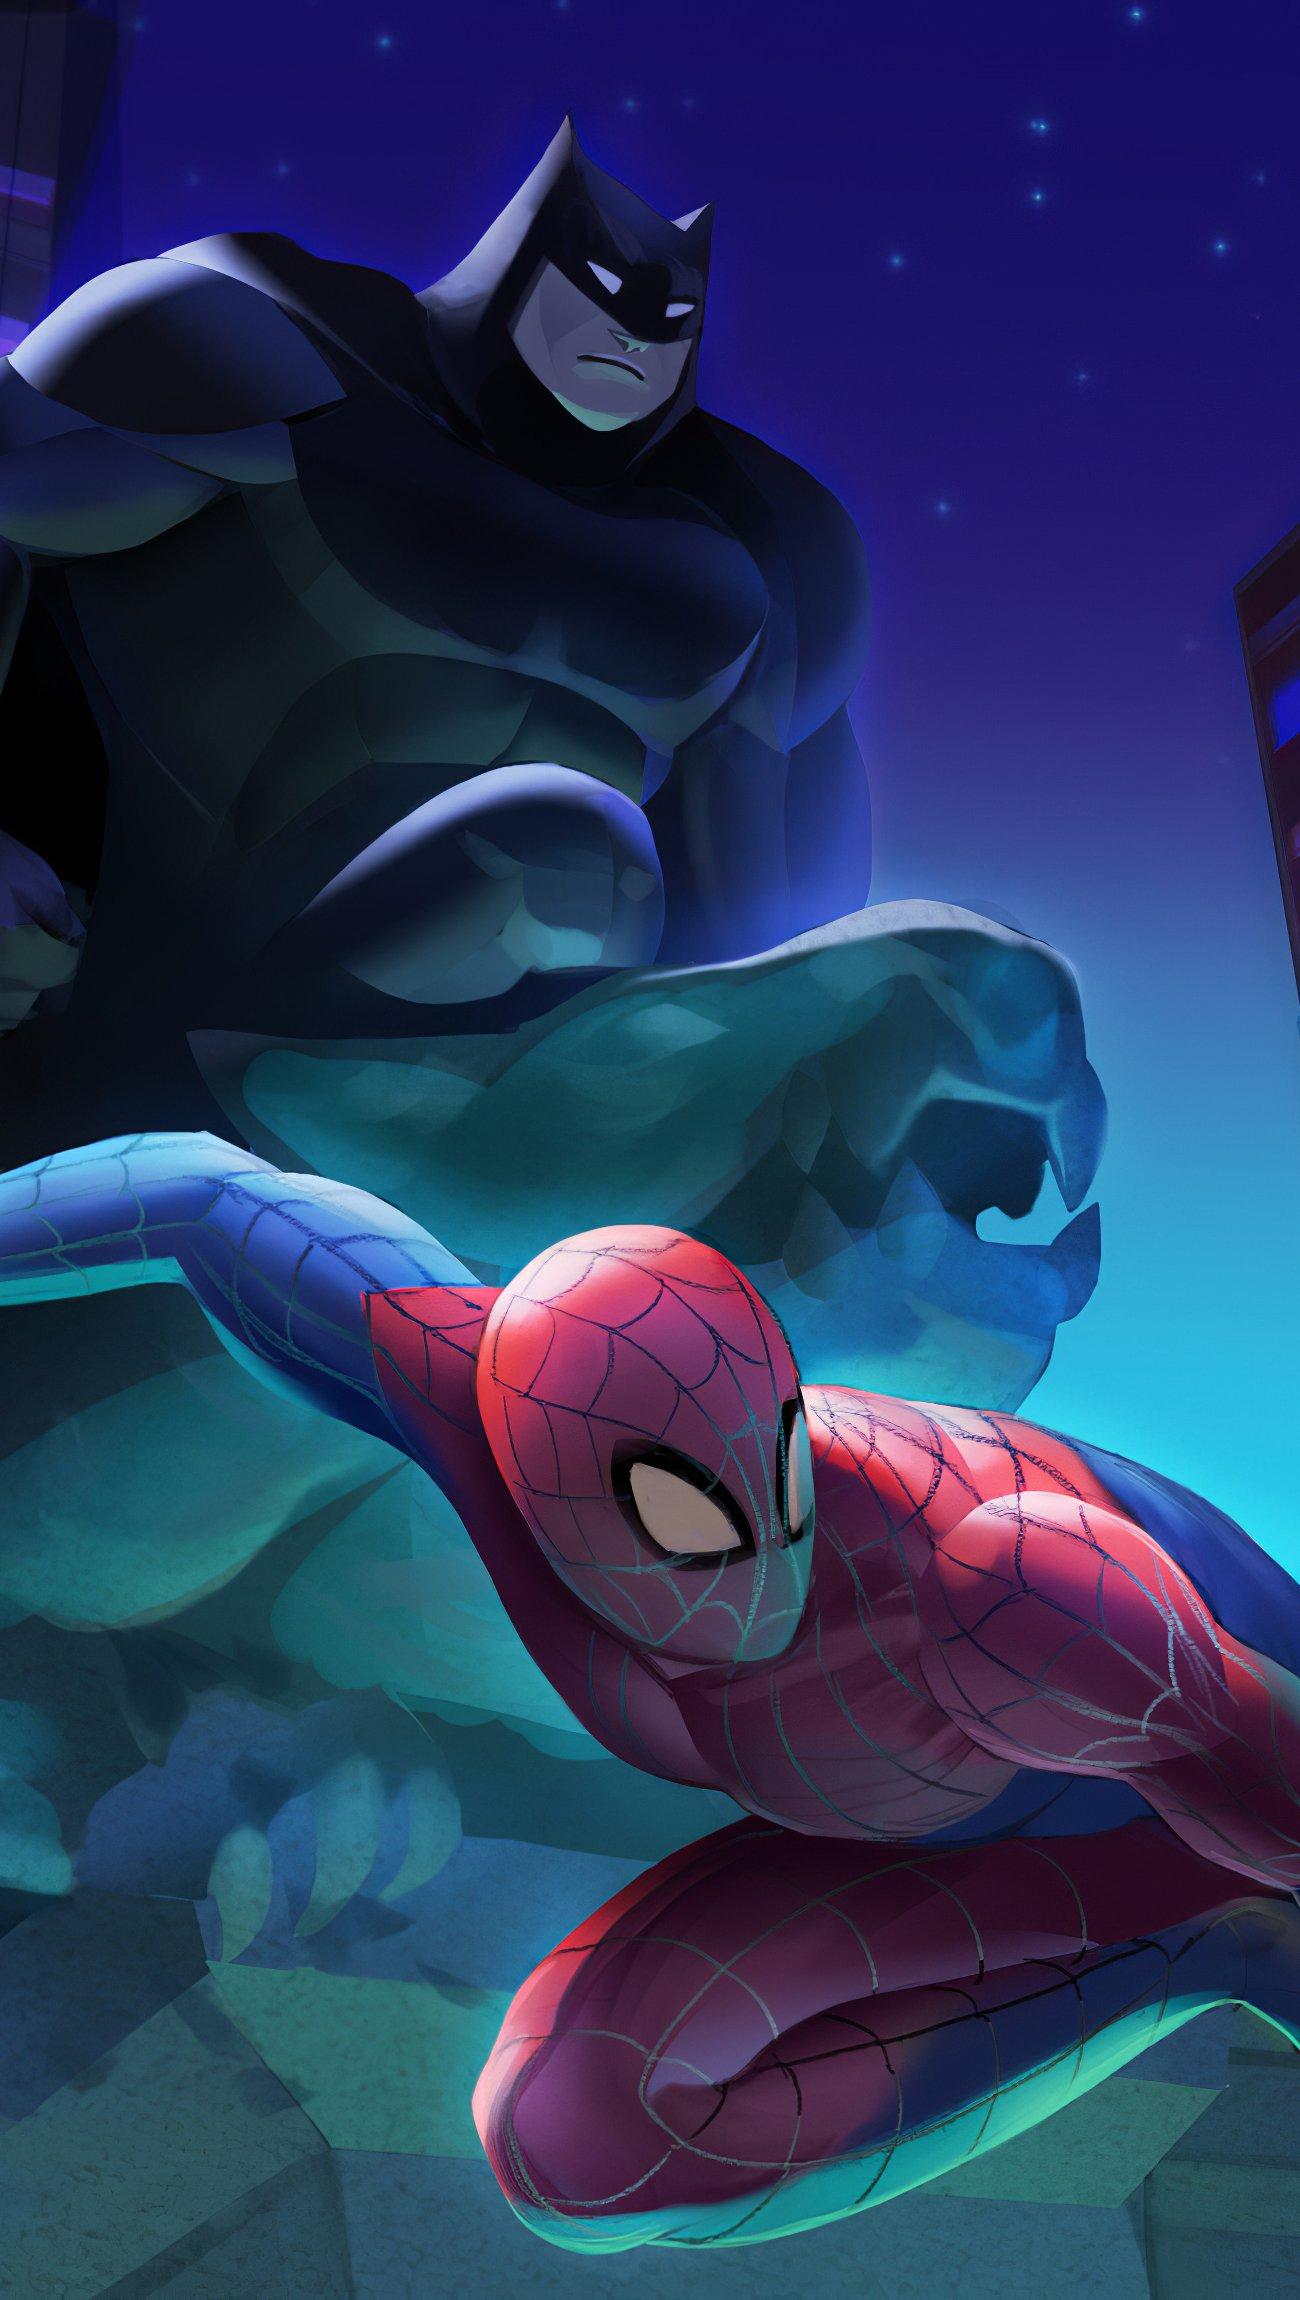 Wallpaper Batman Spiderman and Catwoman Fanart Vertical